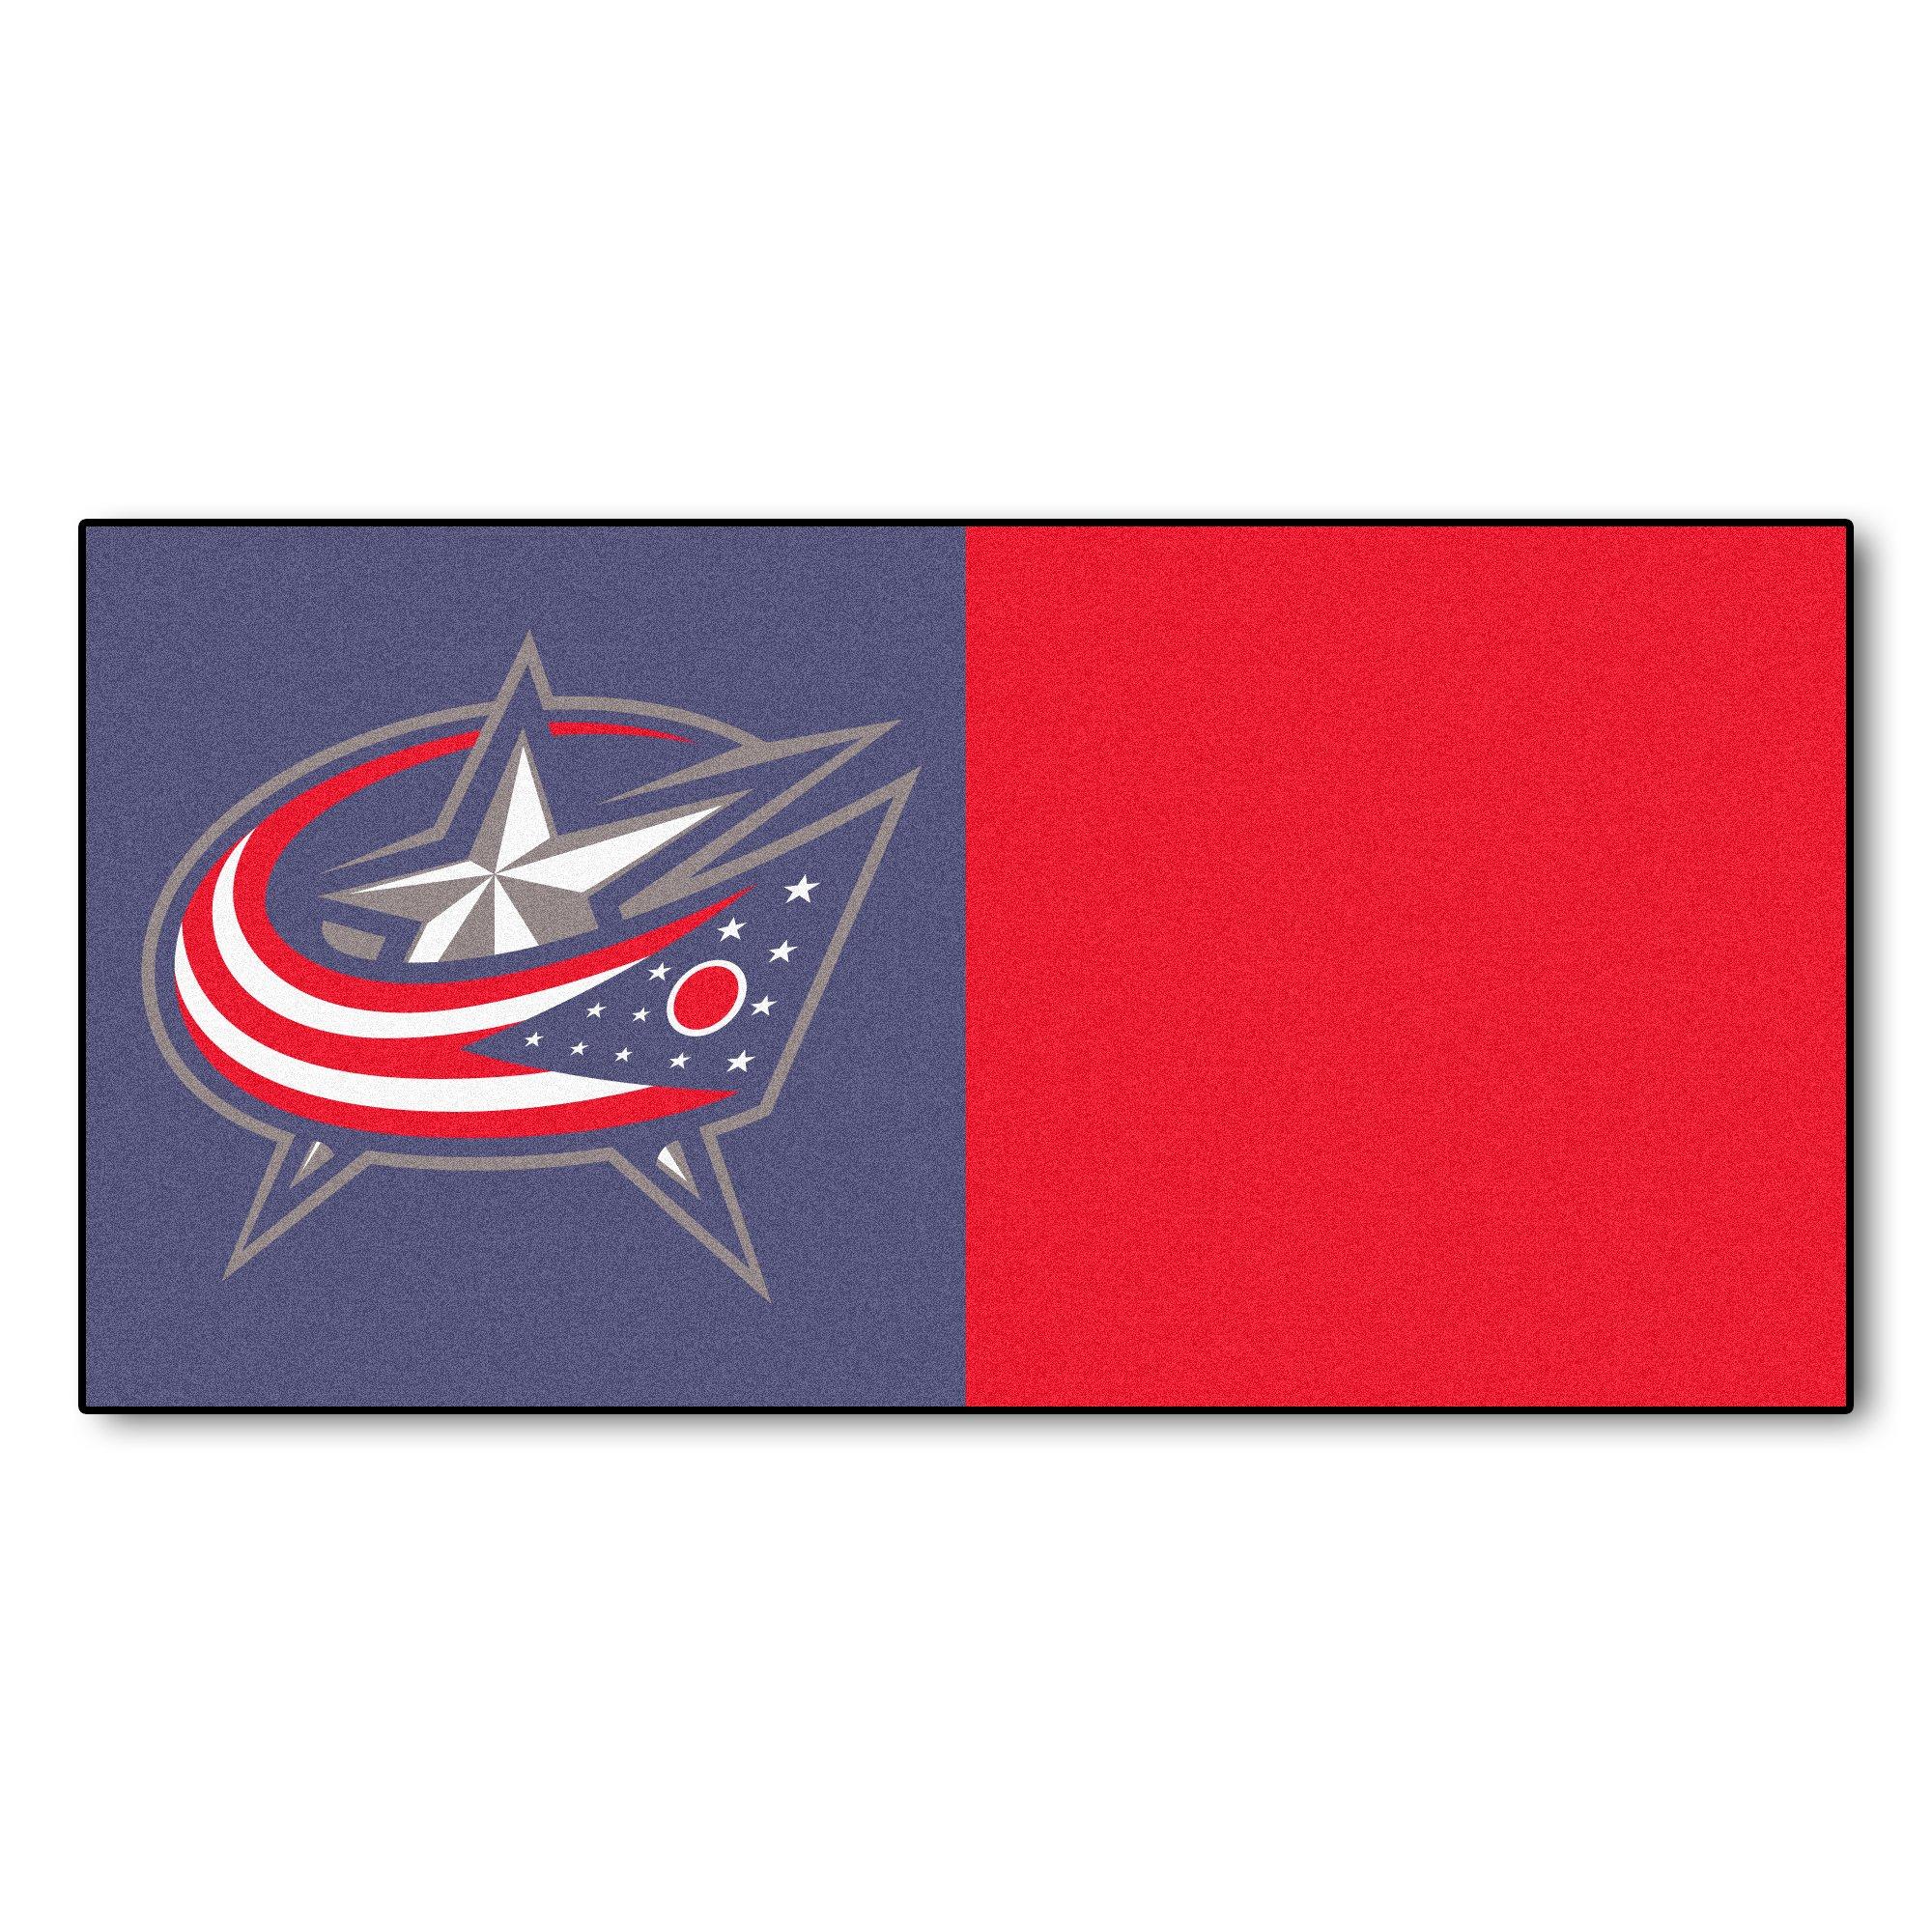 FANMATS NHL Columbus Blue Jackets Nylon Face Team Carpet Tiles by Fanmats